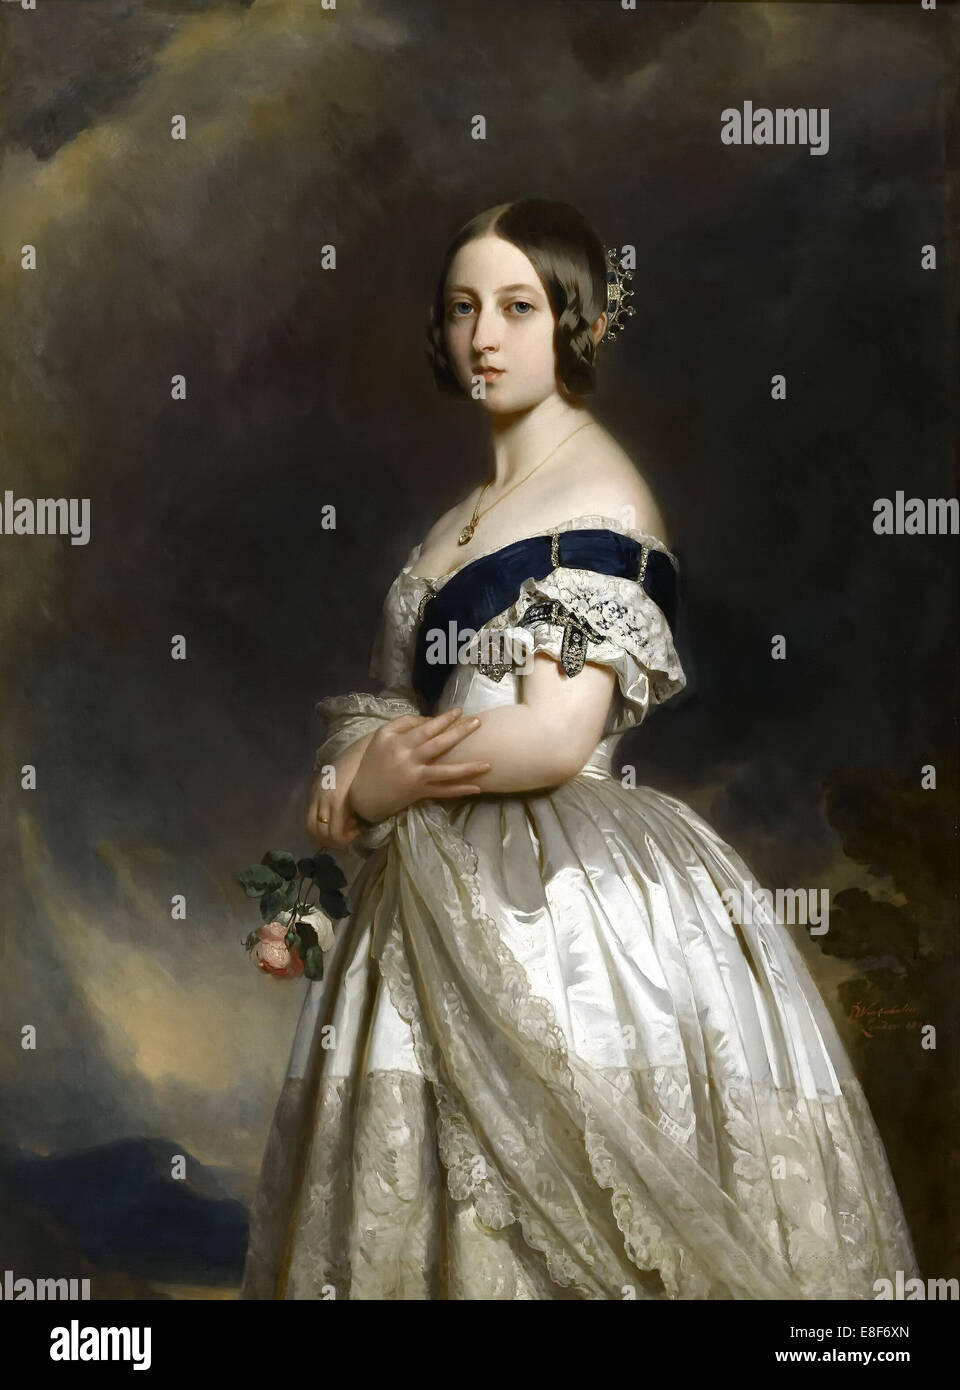 Portrait de la reine Victoria. Artiste: Winterhalter, Franz Xavier (1805-1873) Photo Stock